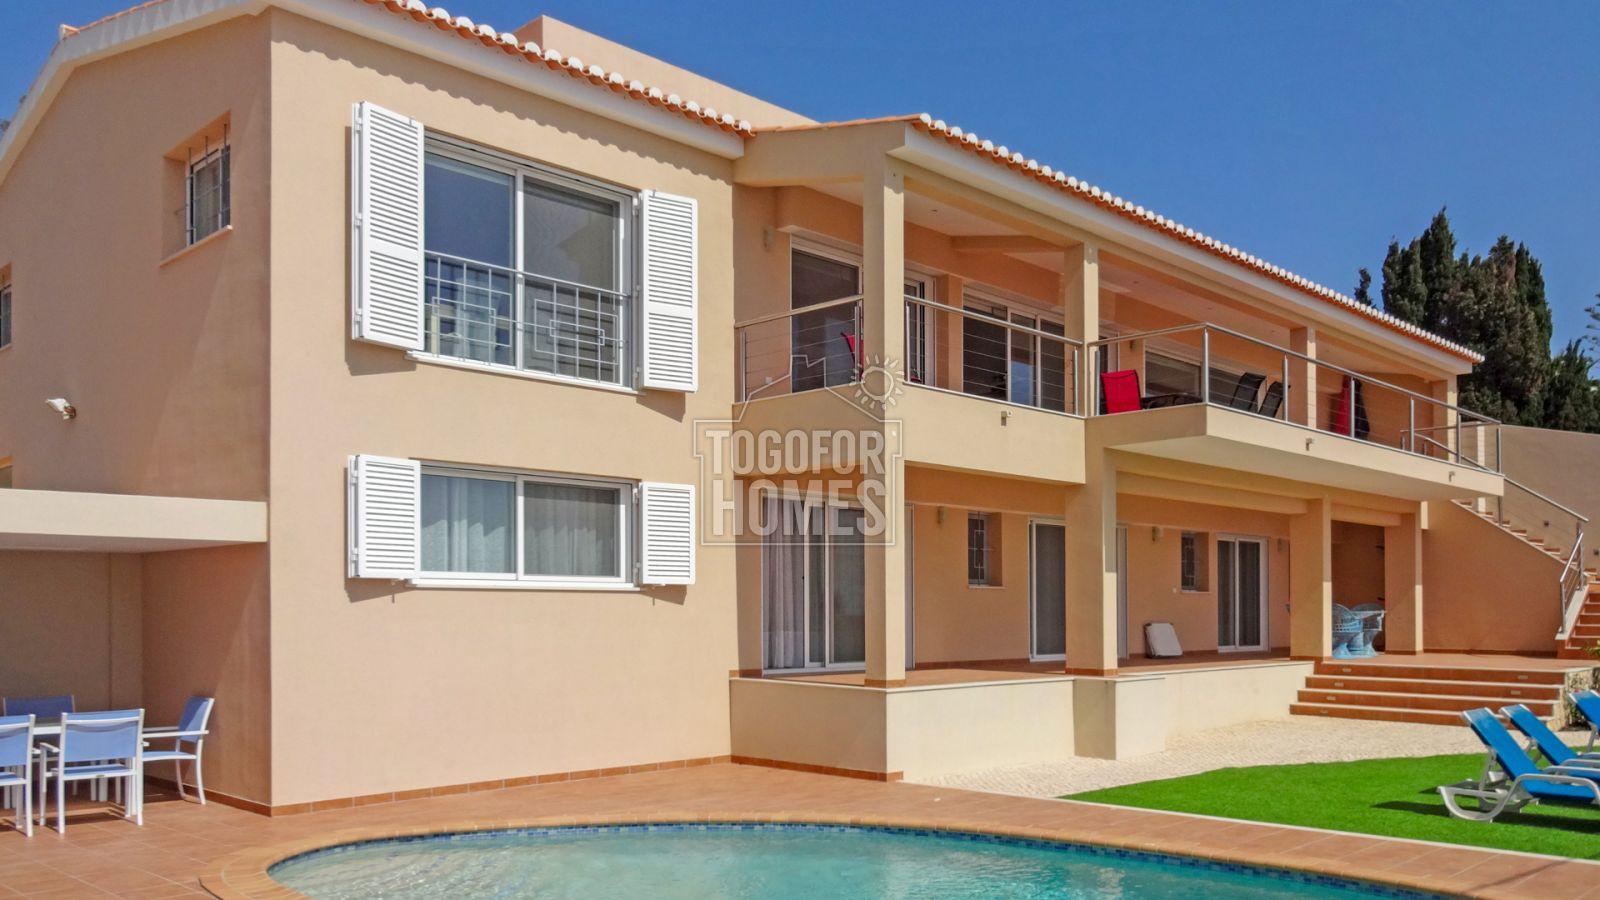 Contemporary front line 4 bedroom villa 10m from beach praia da luz near lagos lg825 togofor homes